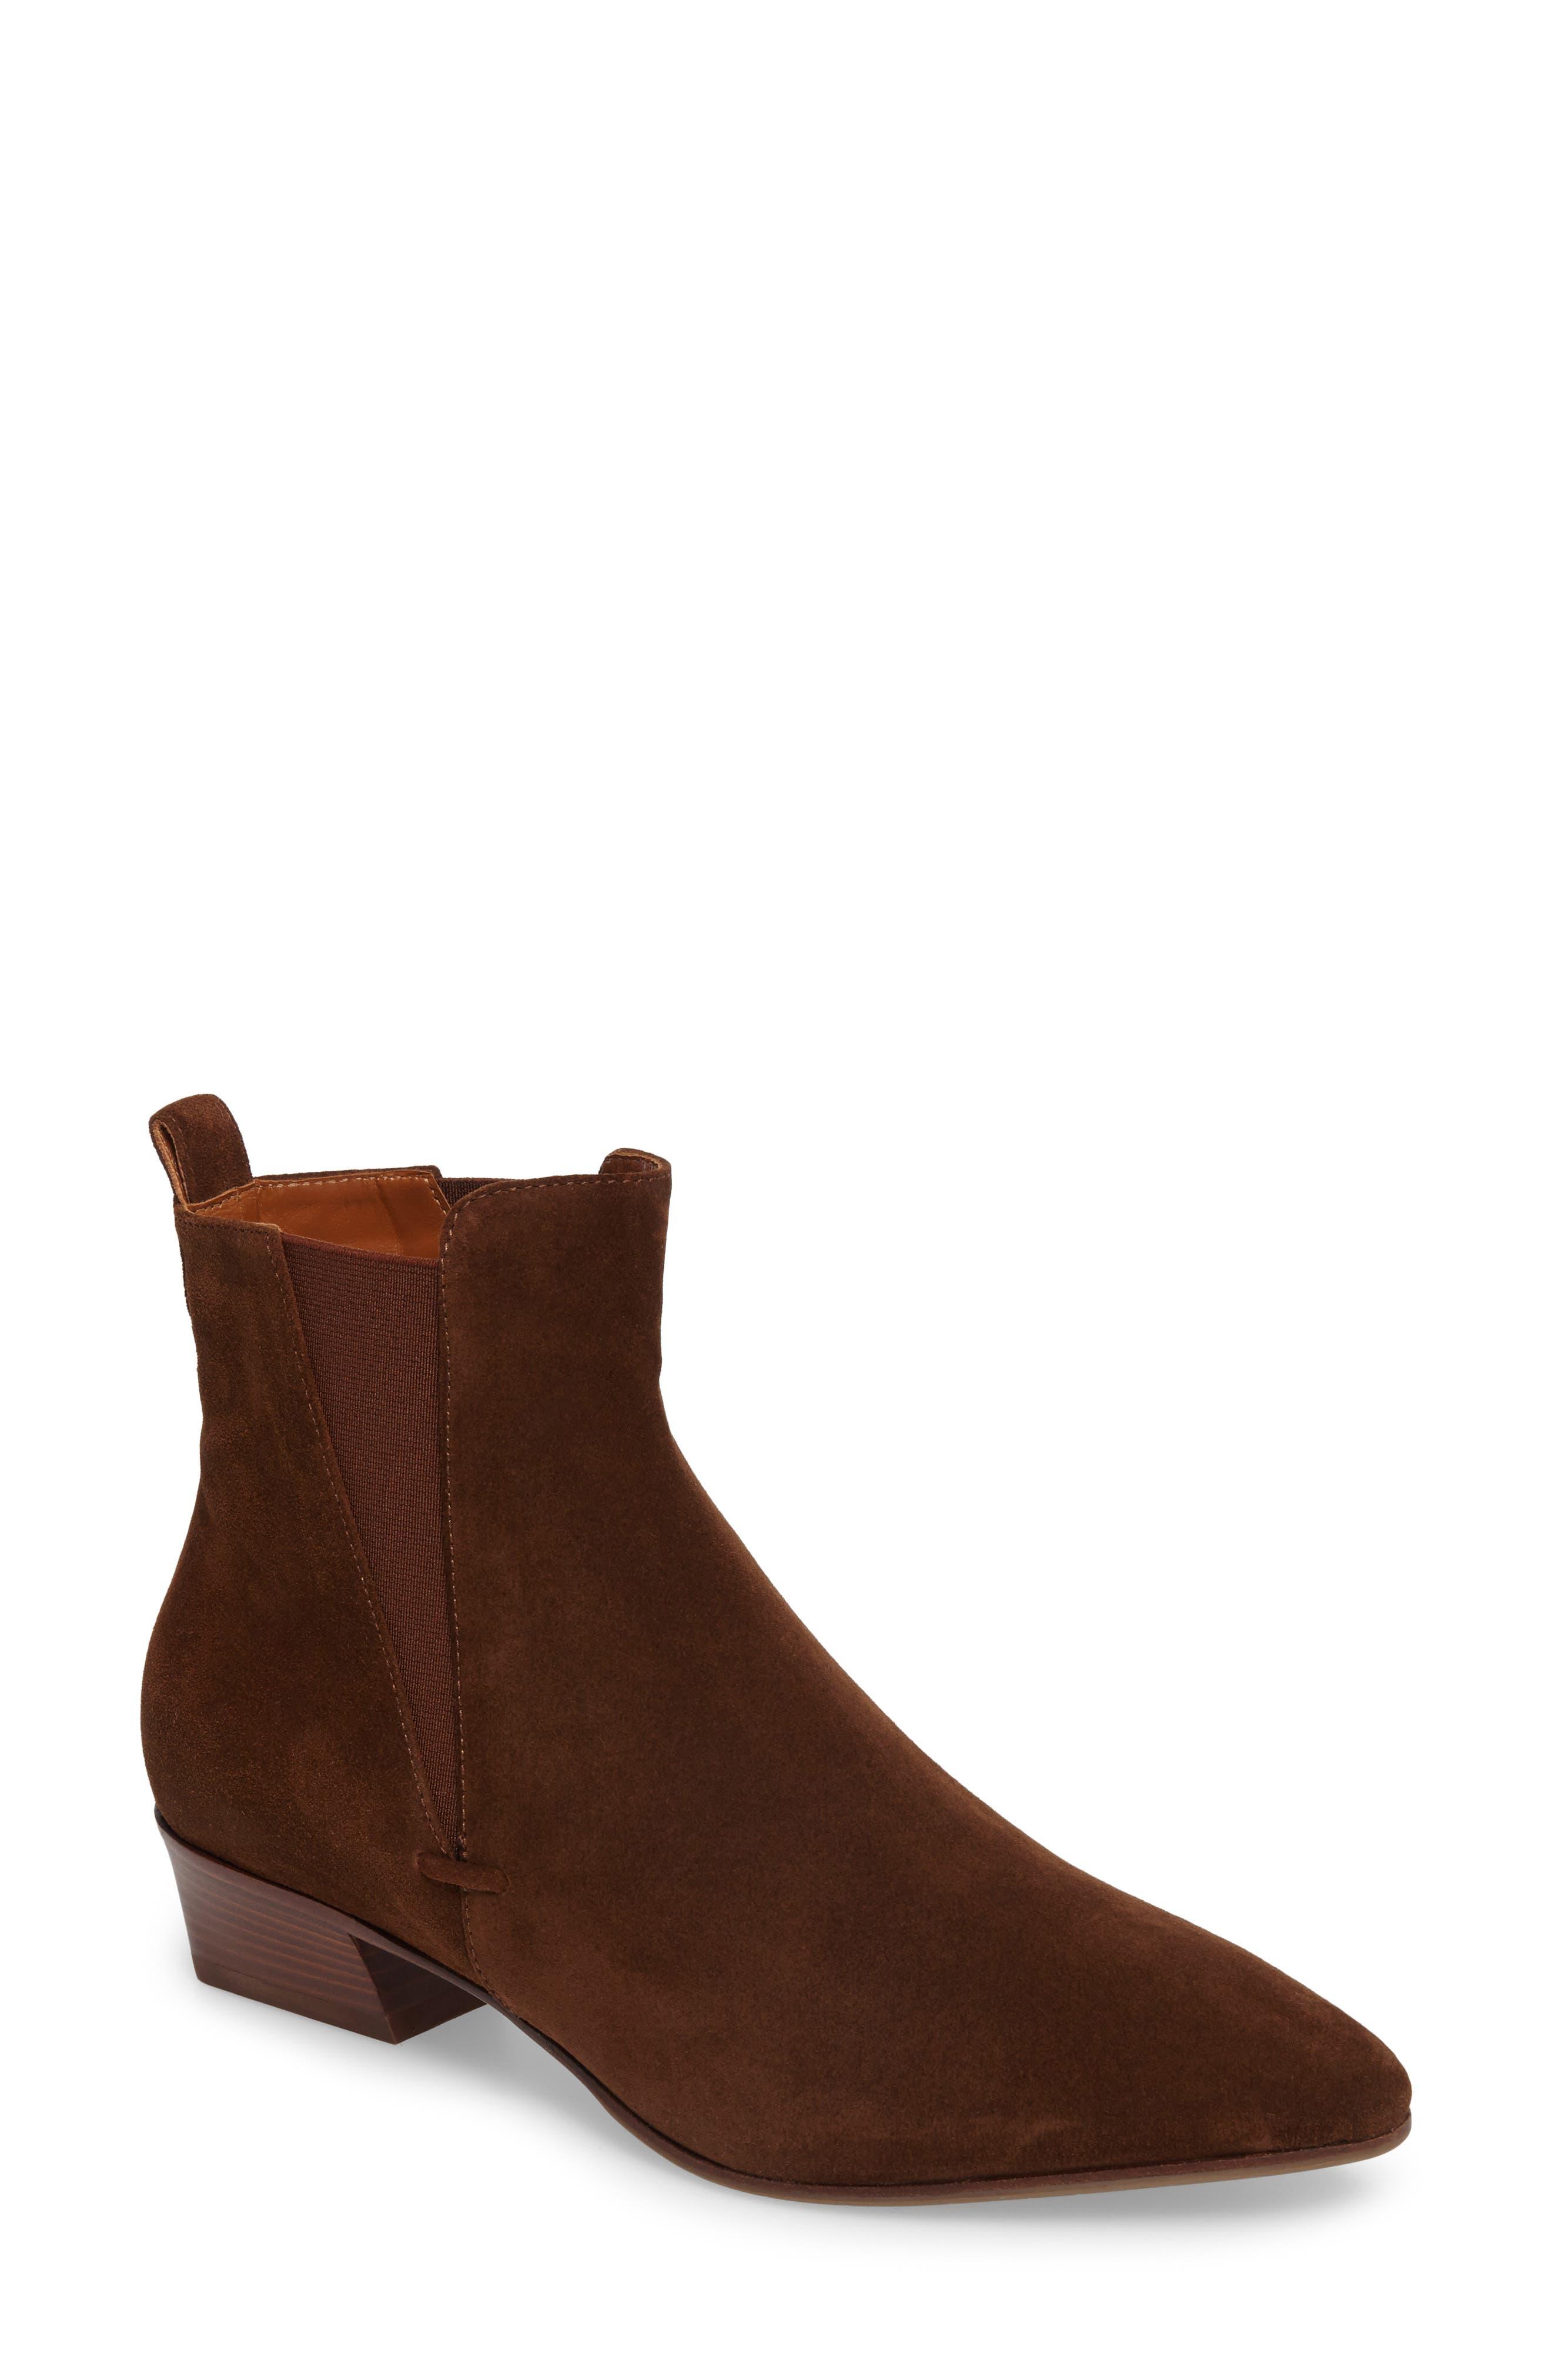 Alternate Image 1 Selected - Aquatalia Fabienne Weatherproof Chelsea Boot (Women)